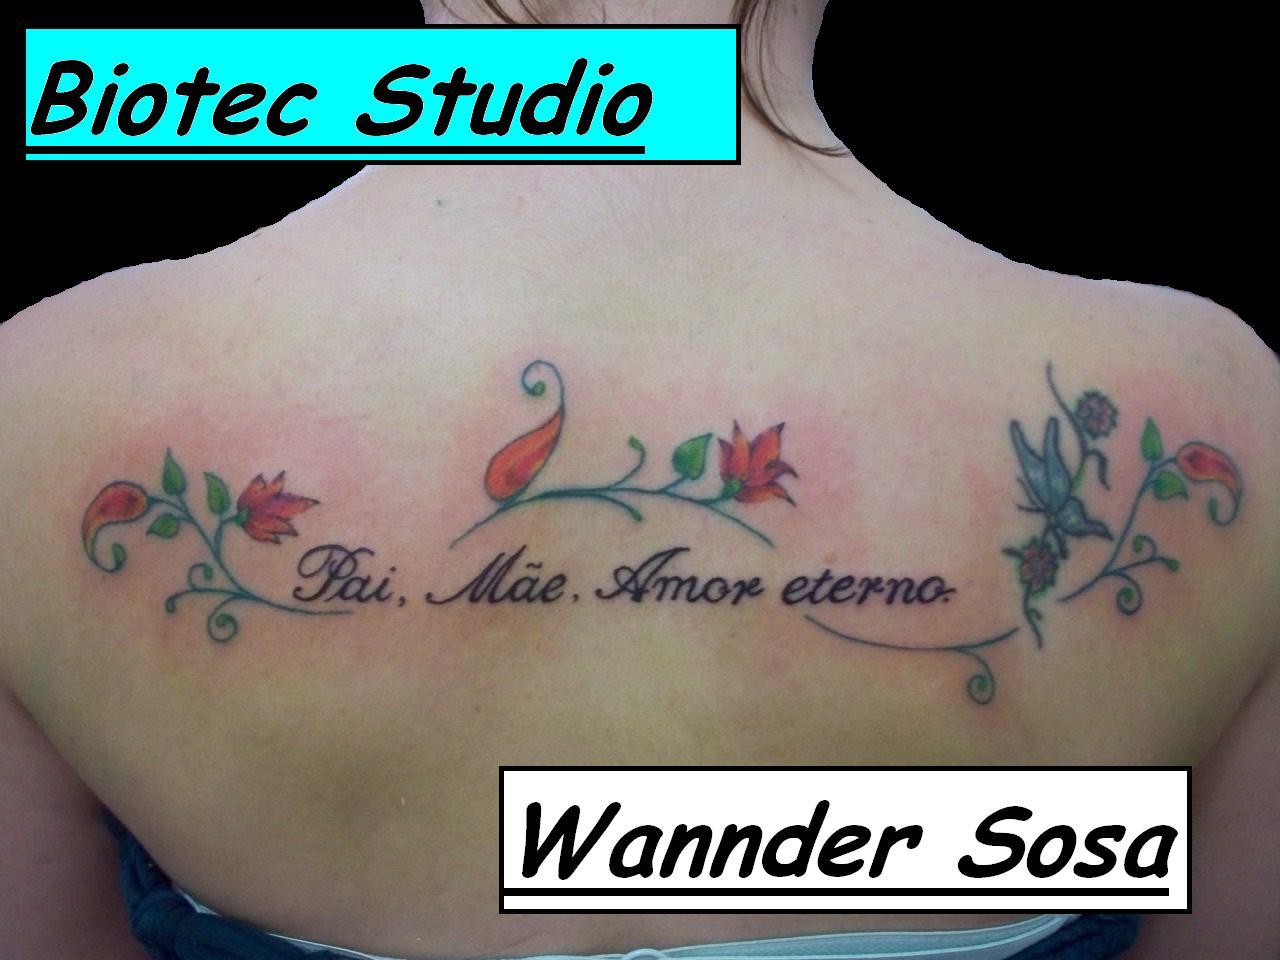 Biotec Studio Tattoo E Body Piercing Pai Mãe Amor Eterno